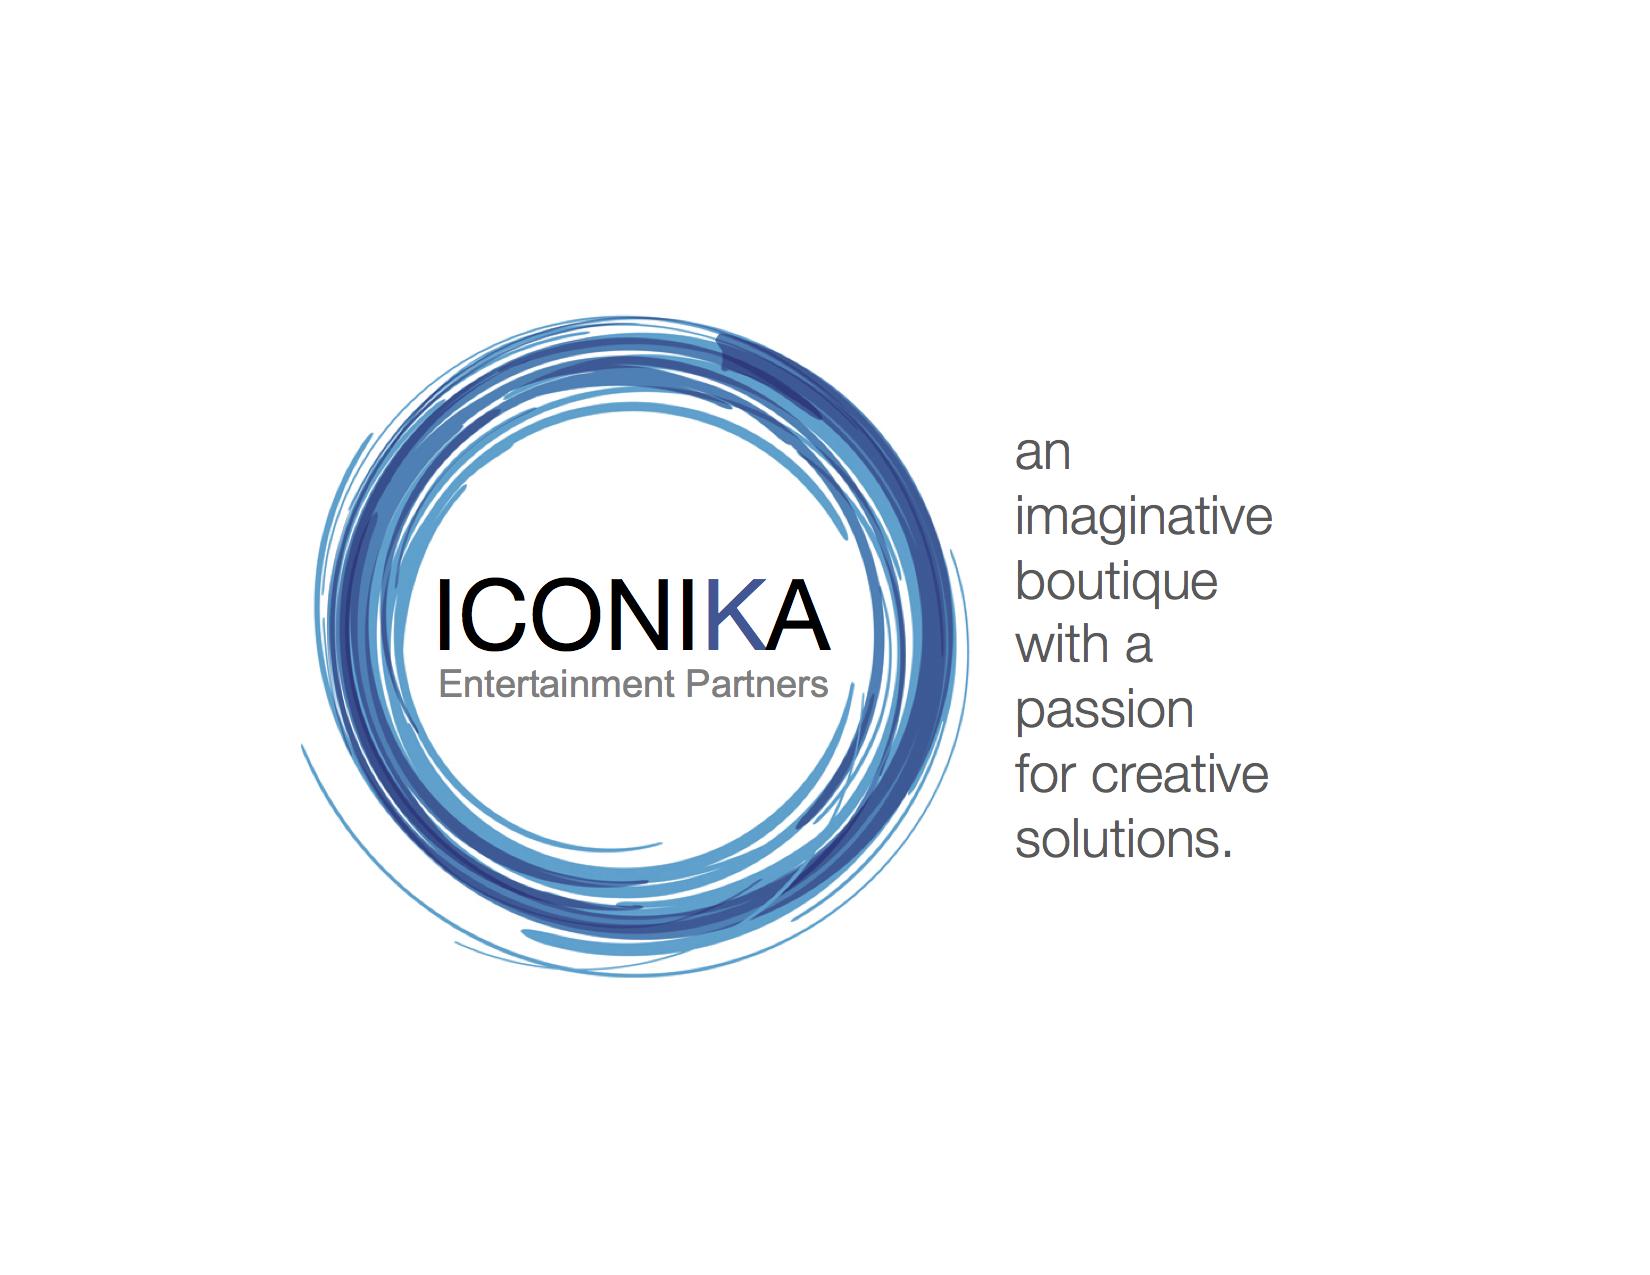 iconika-ep-presentation.png